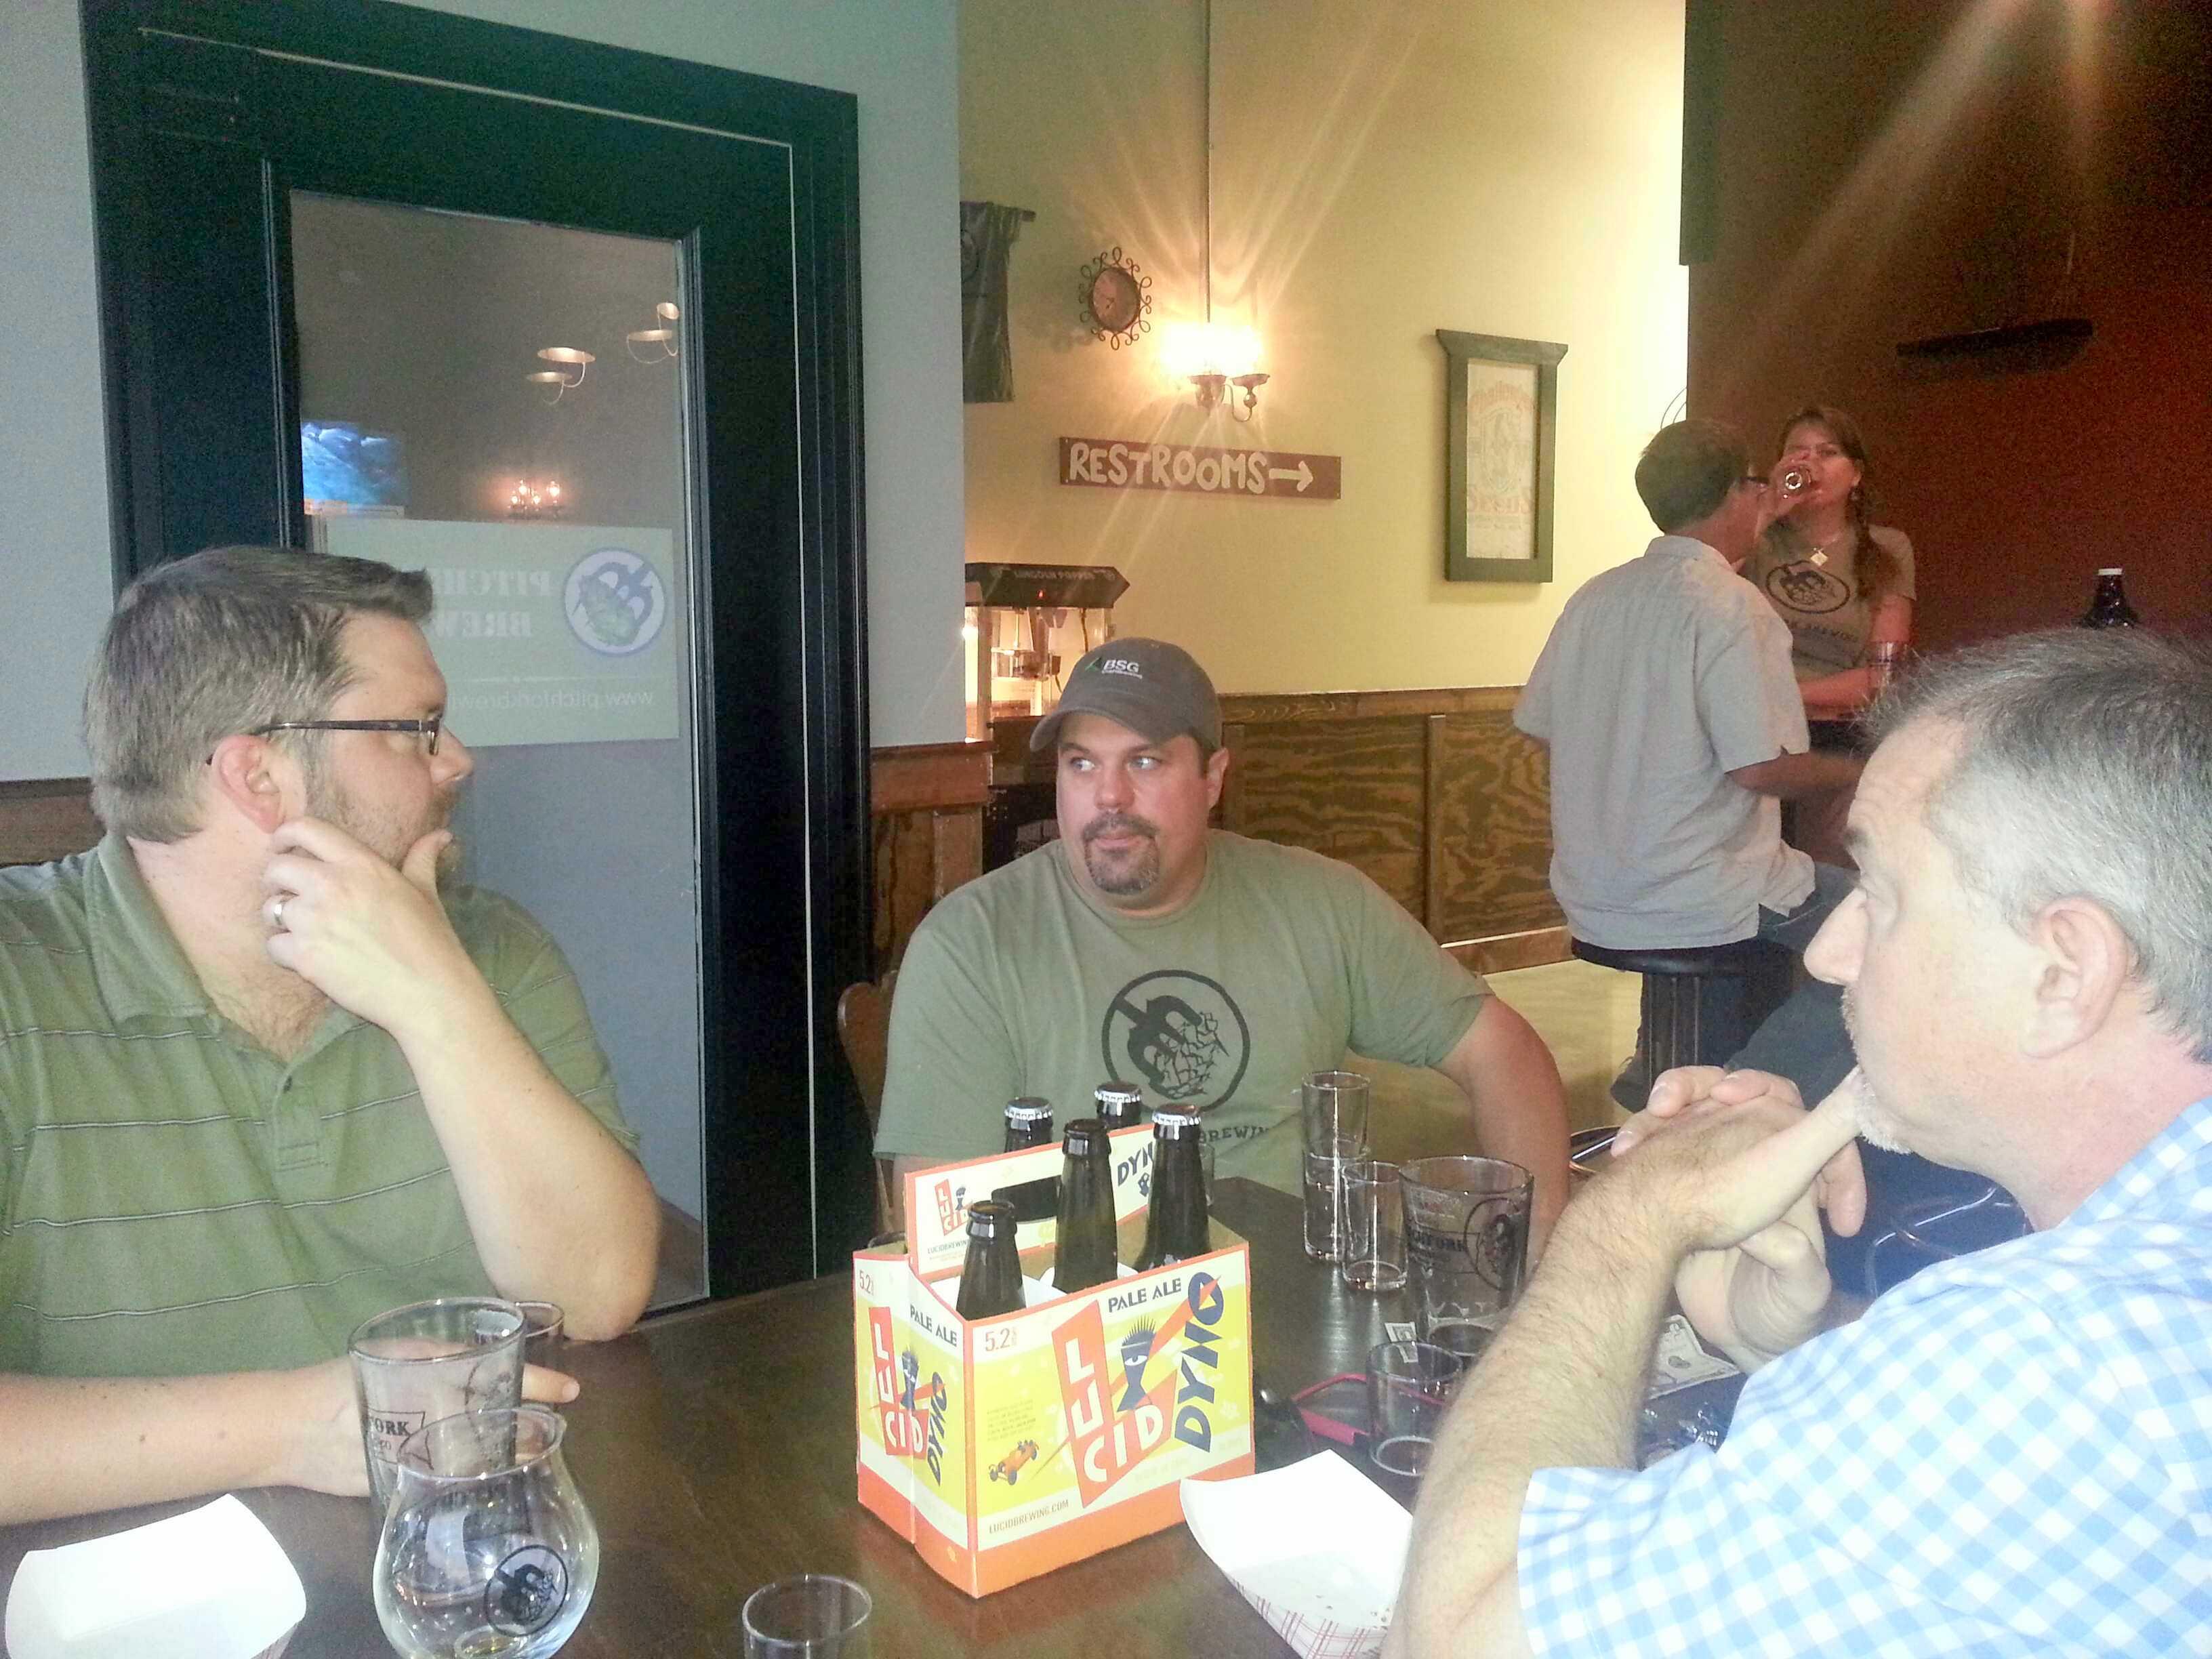 Mike Fredricksen, Pitchfork Brewing owner and Operator